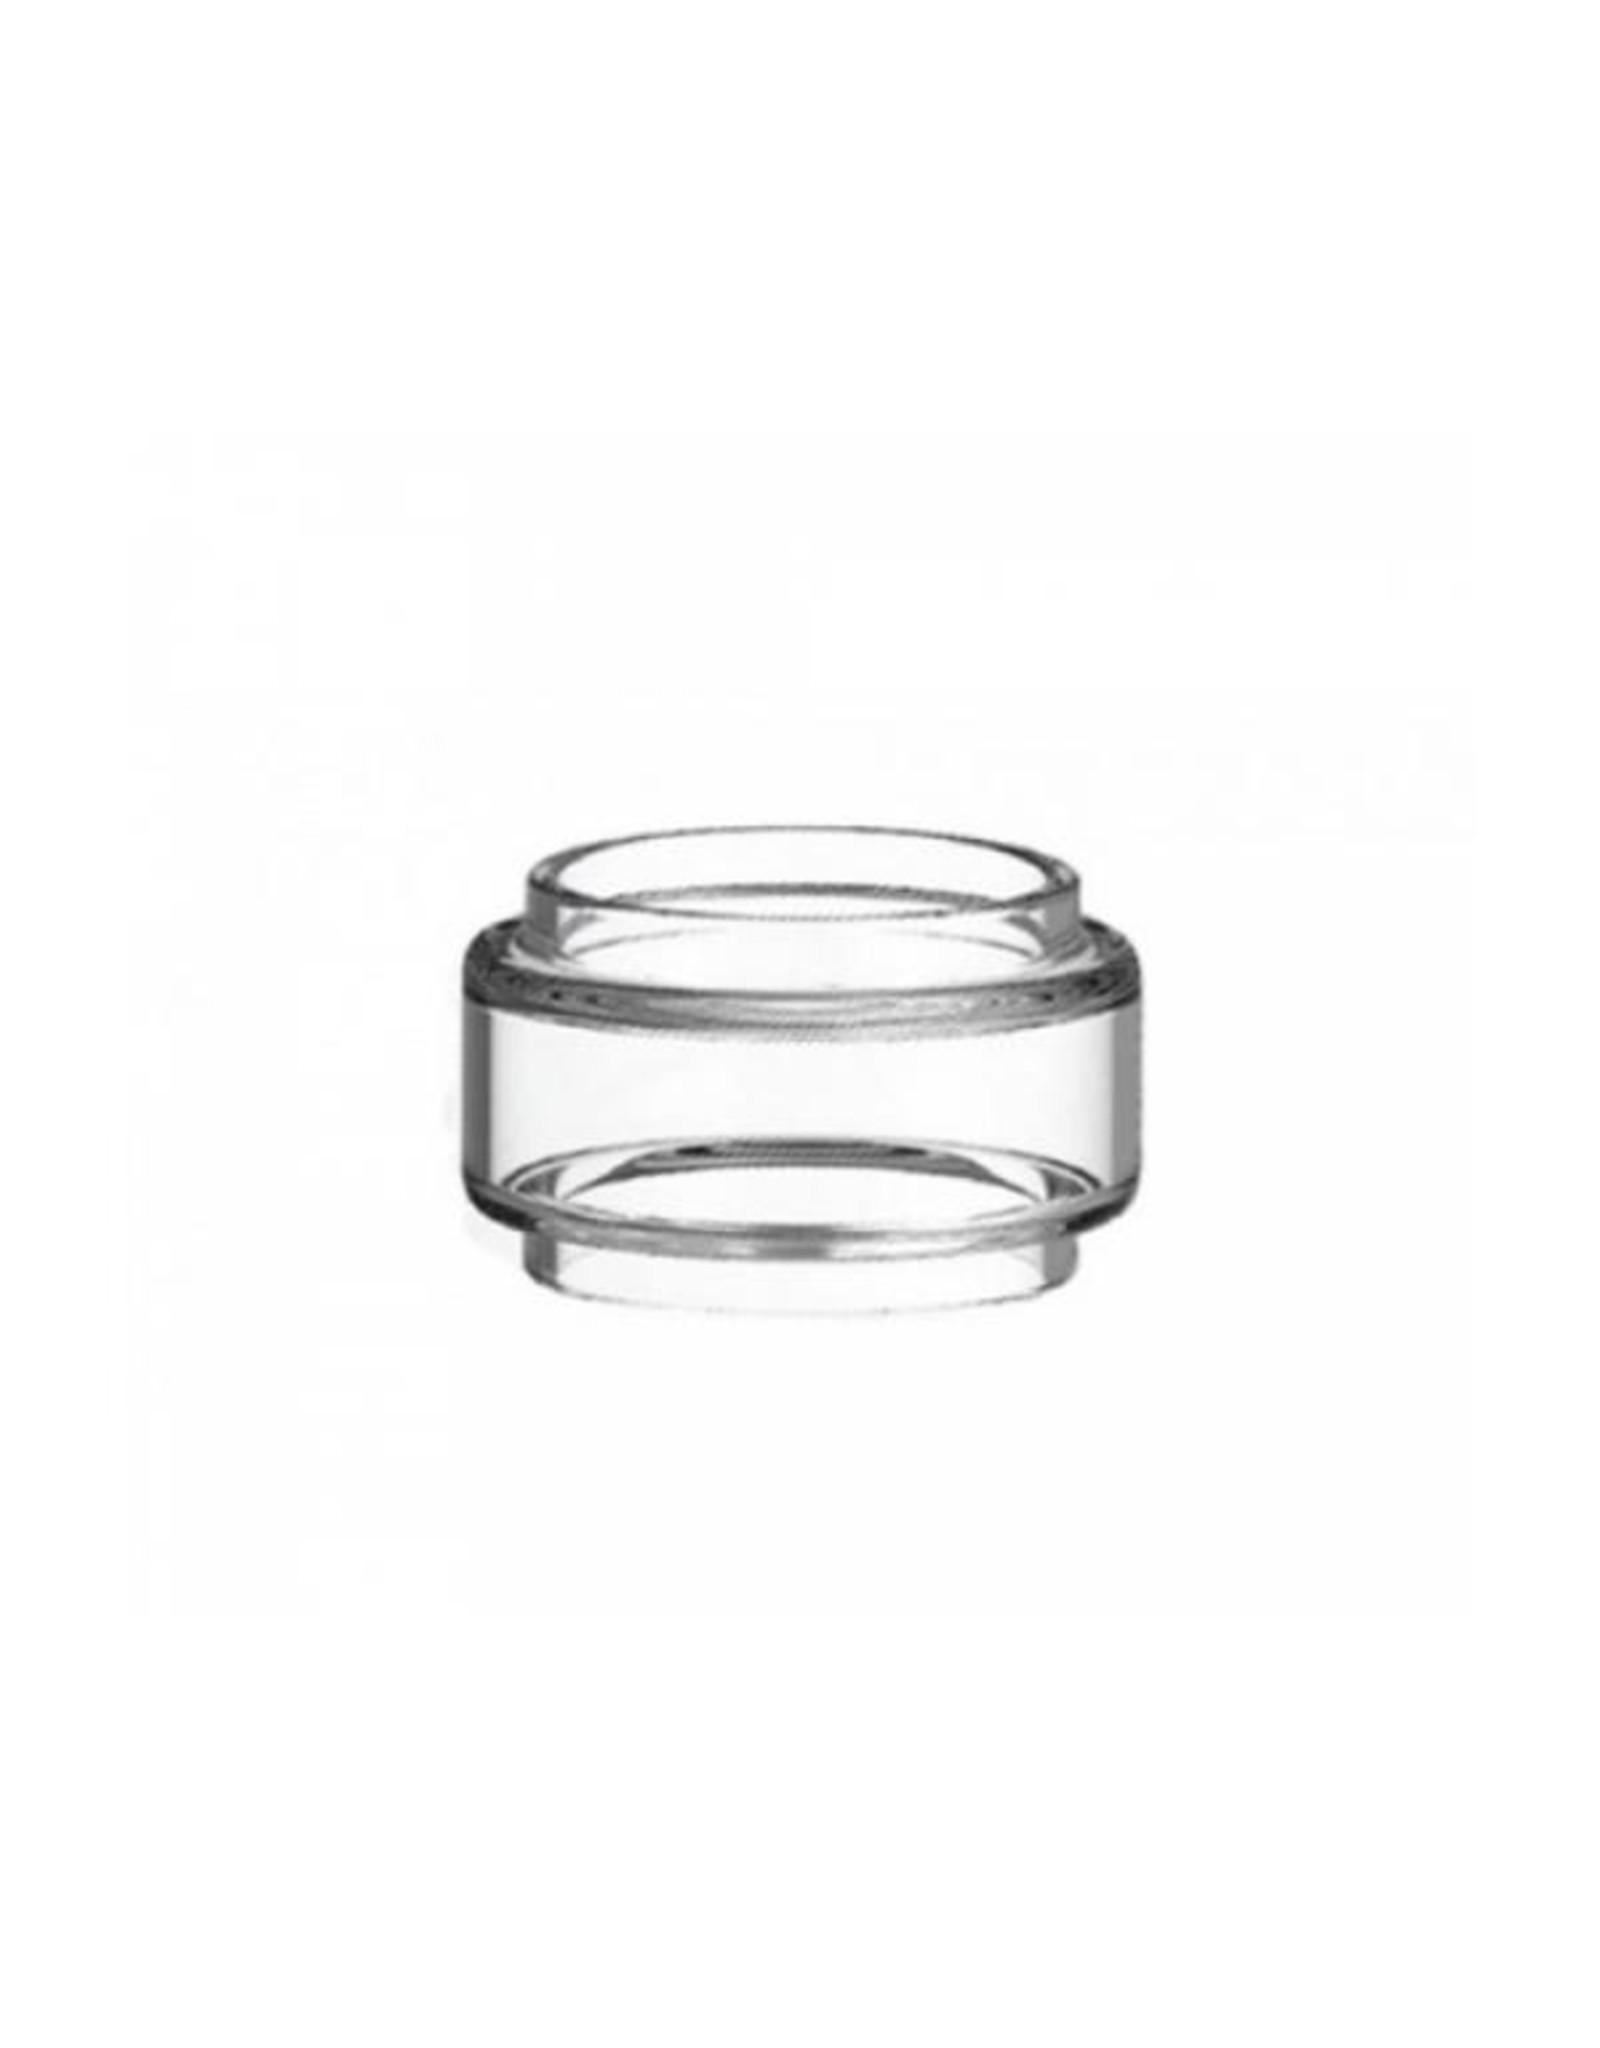 SMOK TFV8 Baby V2 Replacement Bulb Glass #7